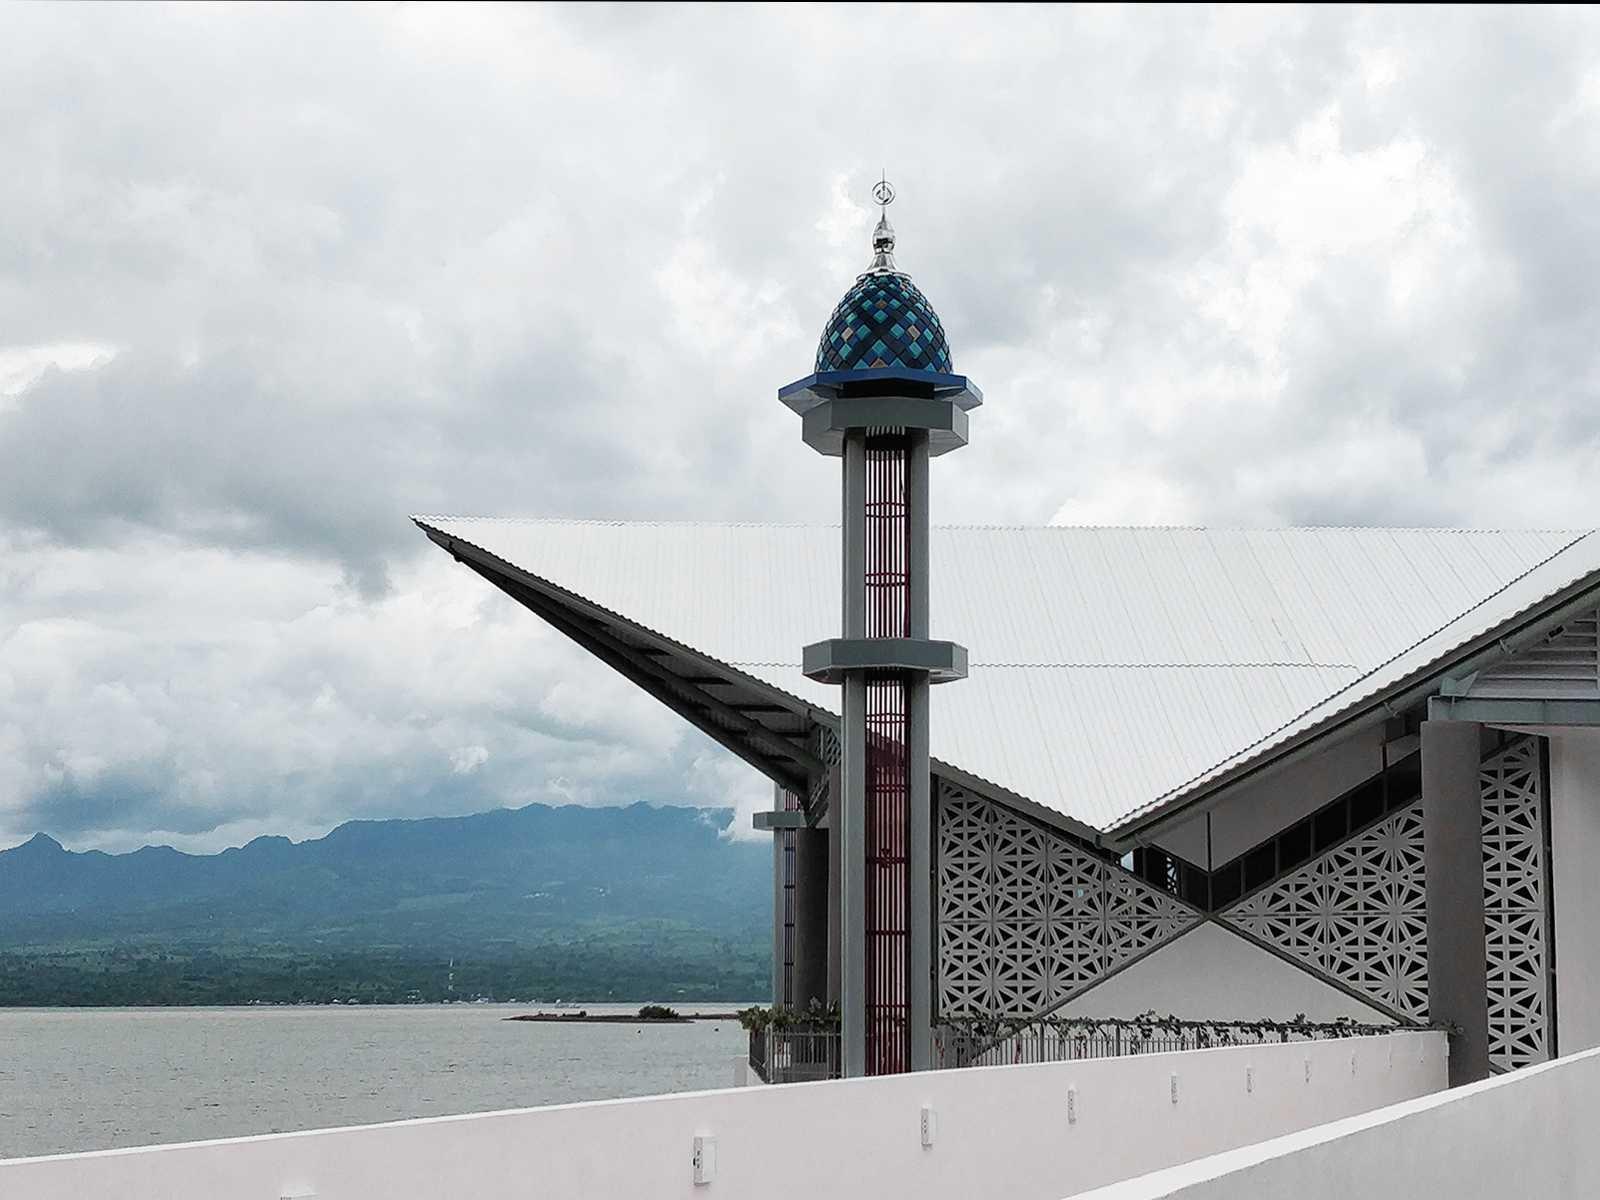 Bramasta Redy Masjid Apung Amahami Bima, Nusa Tenggara Bar., Indonesia Bima, Nusa Tenggara Bar., Indonesia Bramasta-Redy-Masjid-Apung-Amahami  65770